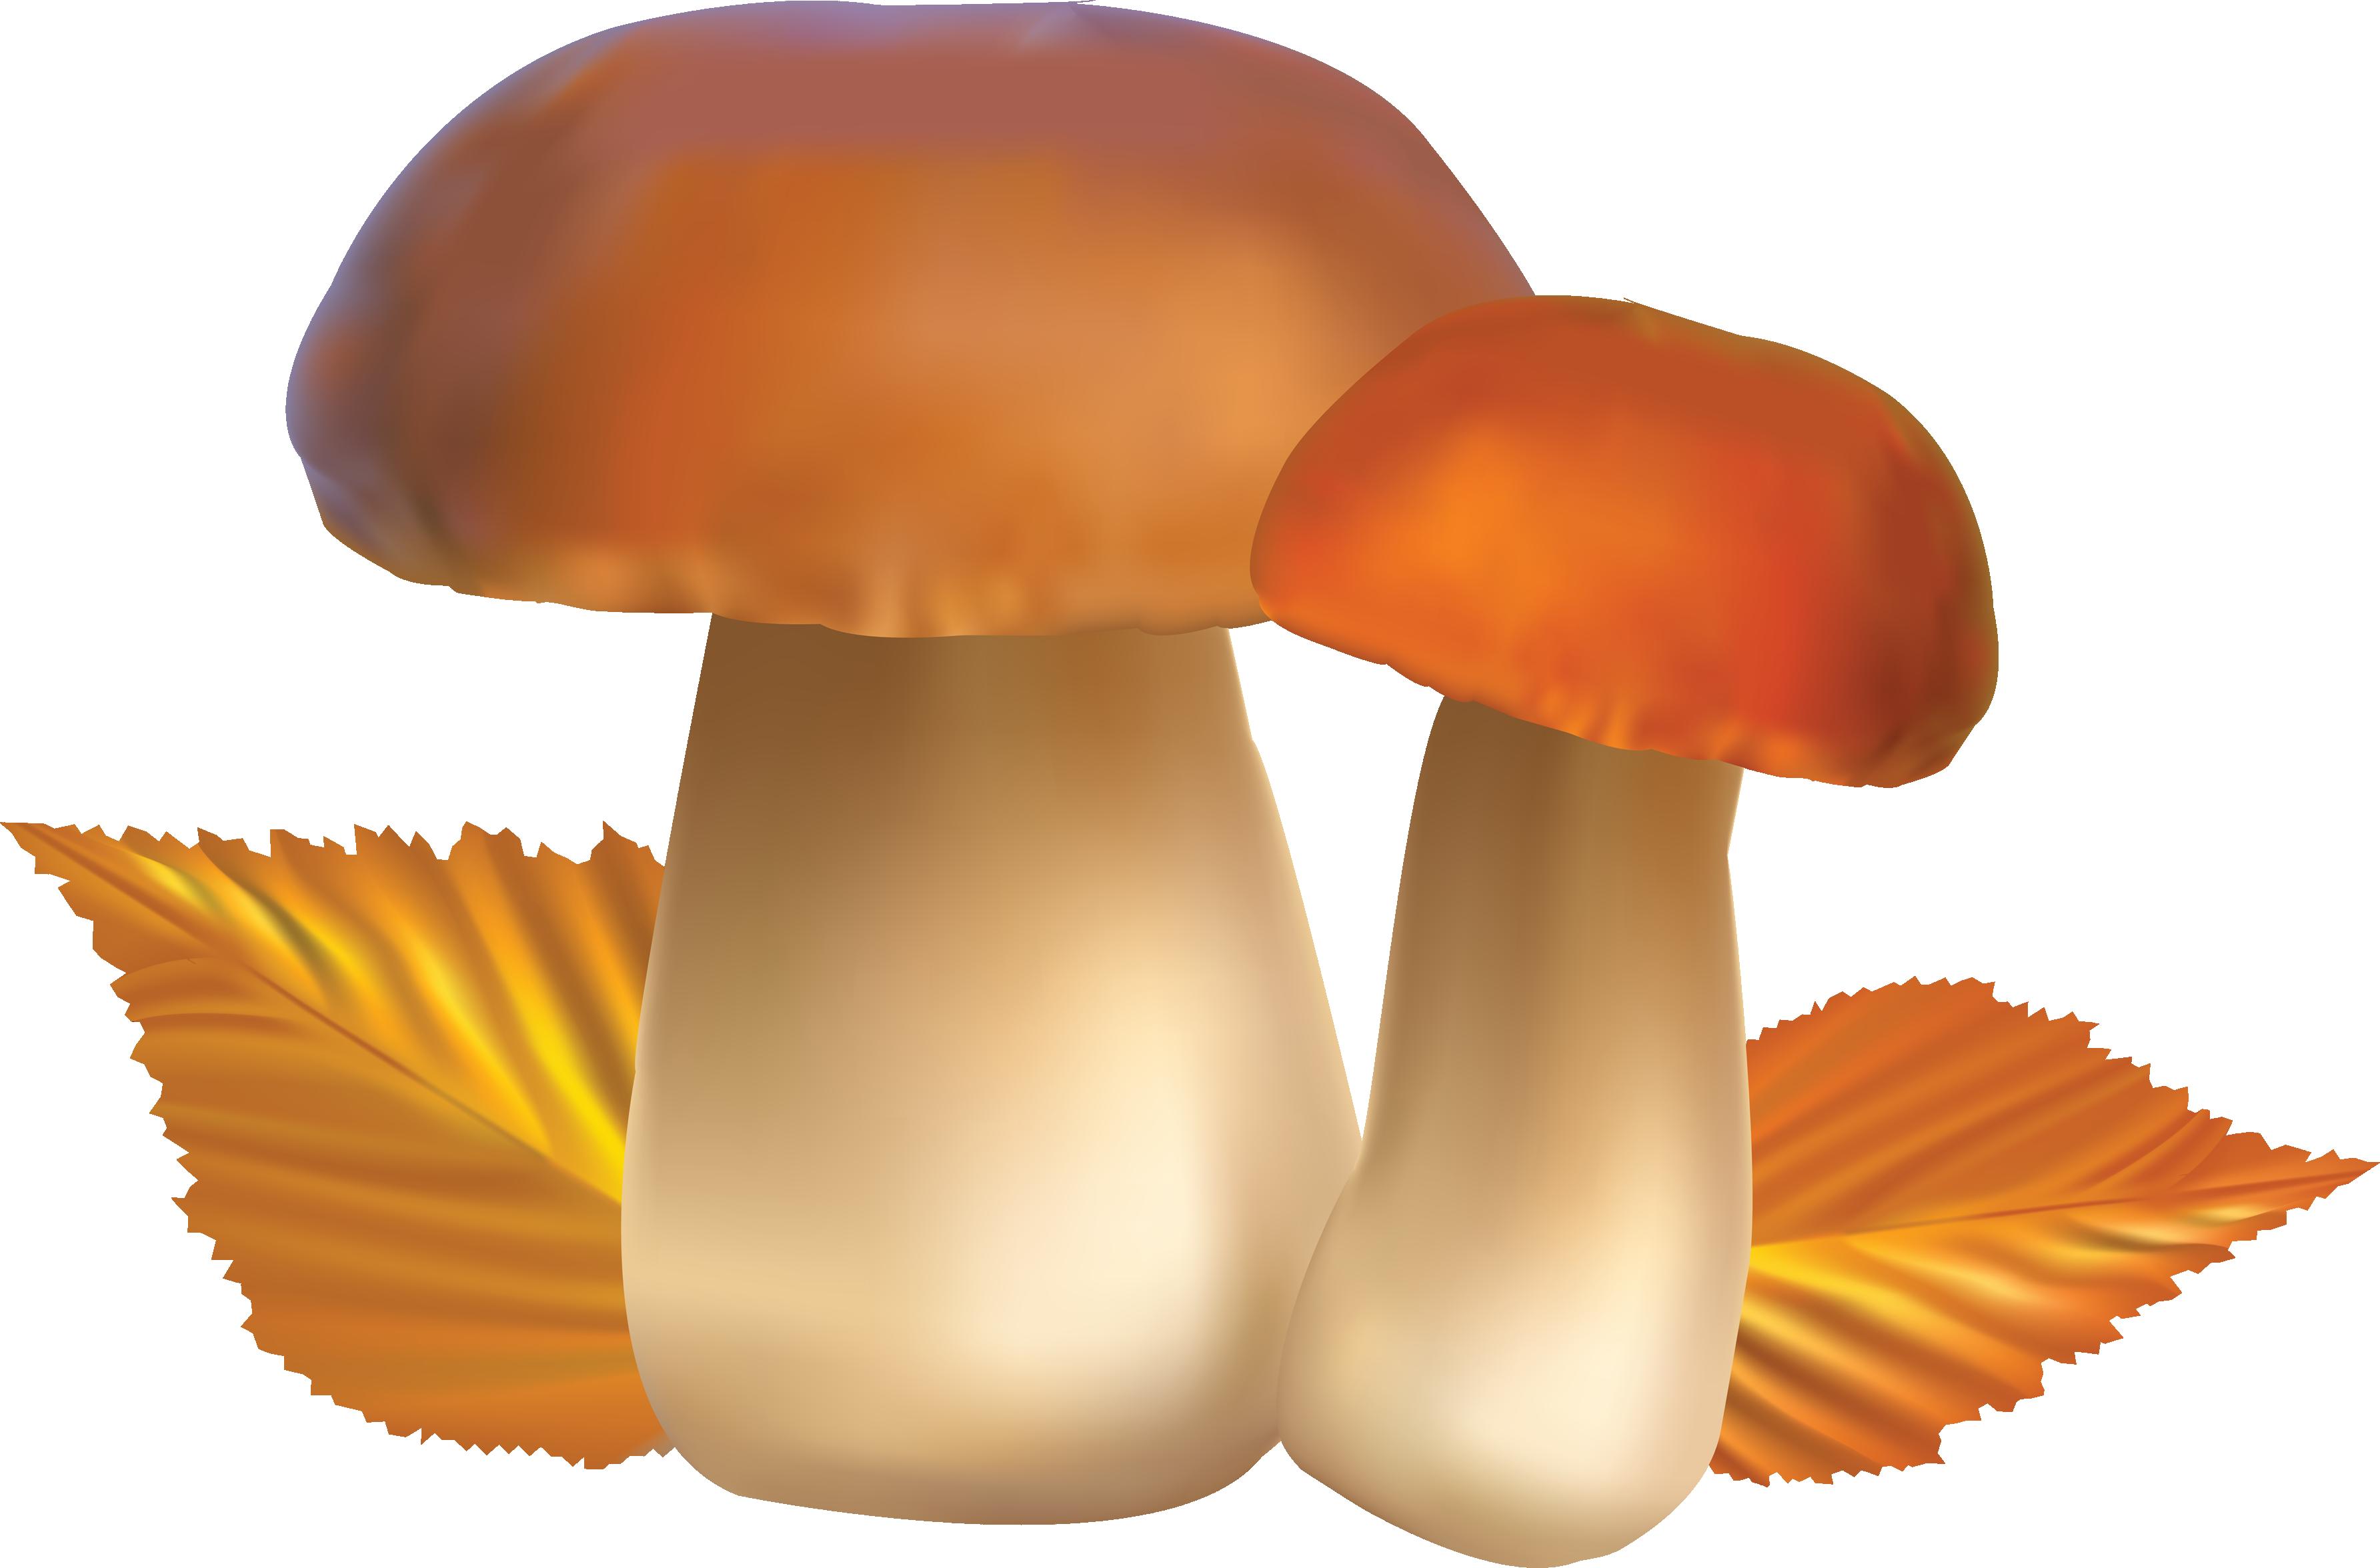 Clipart food mushroom. Png image lots clip